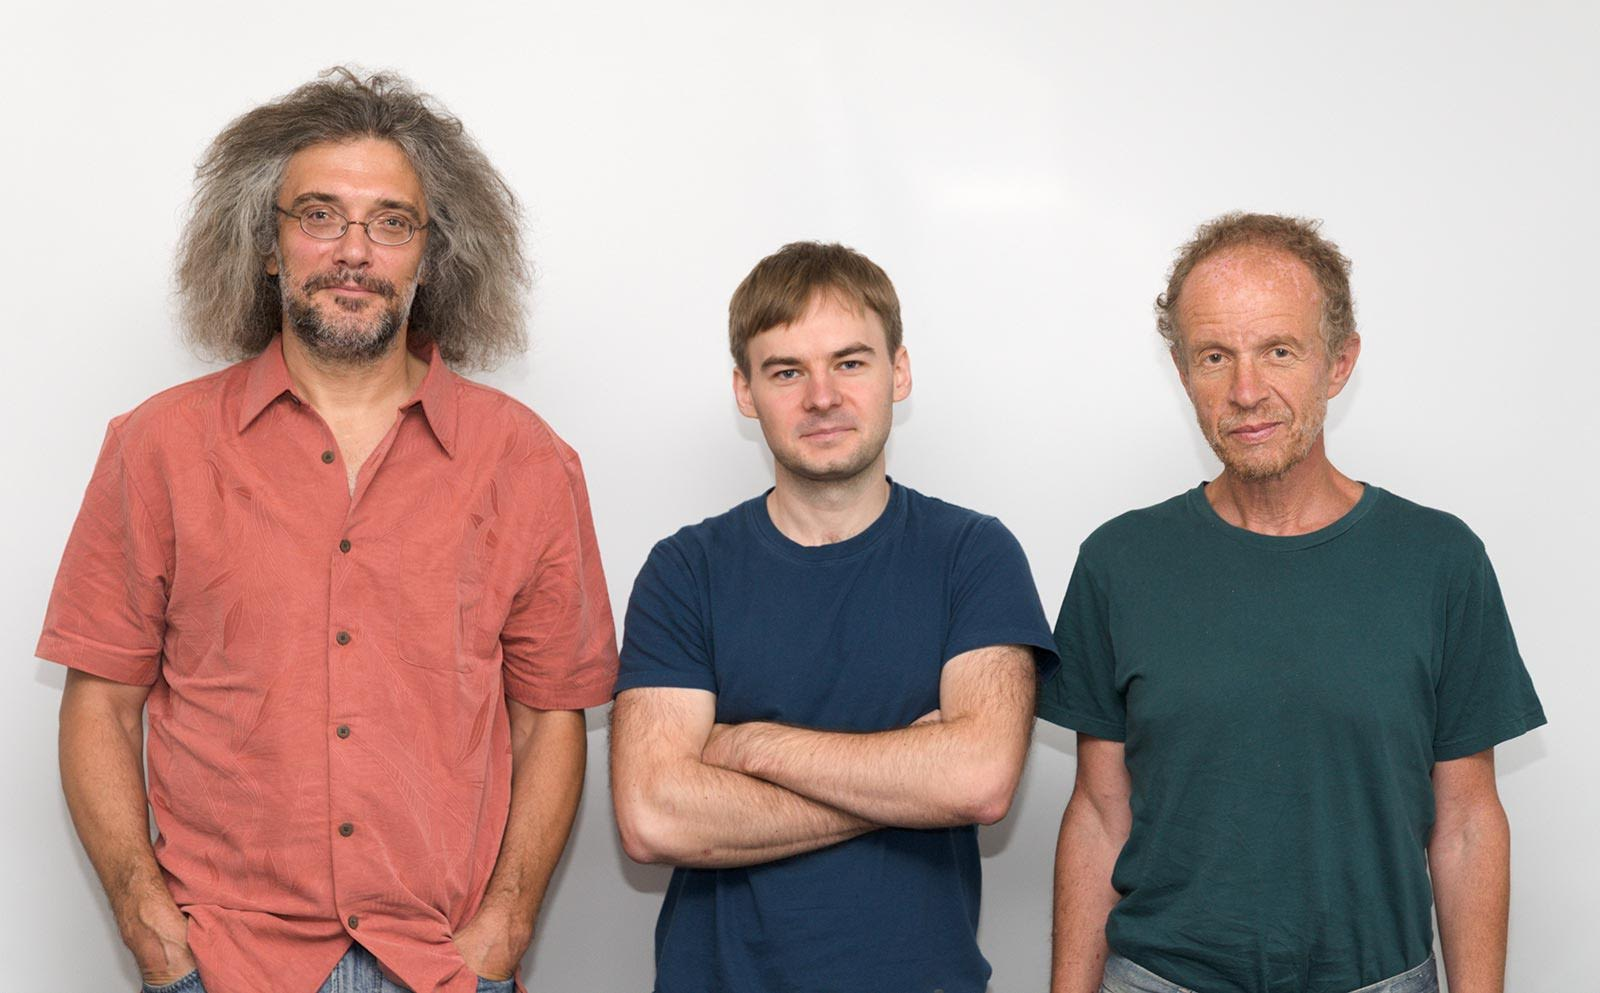 Sergey Shmakov (center) and his supervisors Konstantin Severinov (left) and Evgeny Kunin (right). Photo: Skoltech.